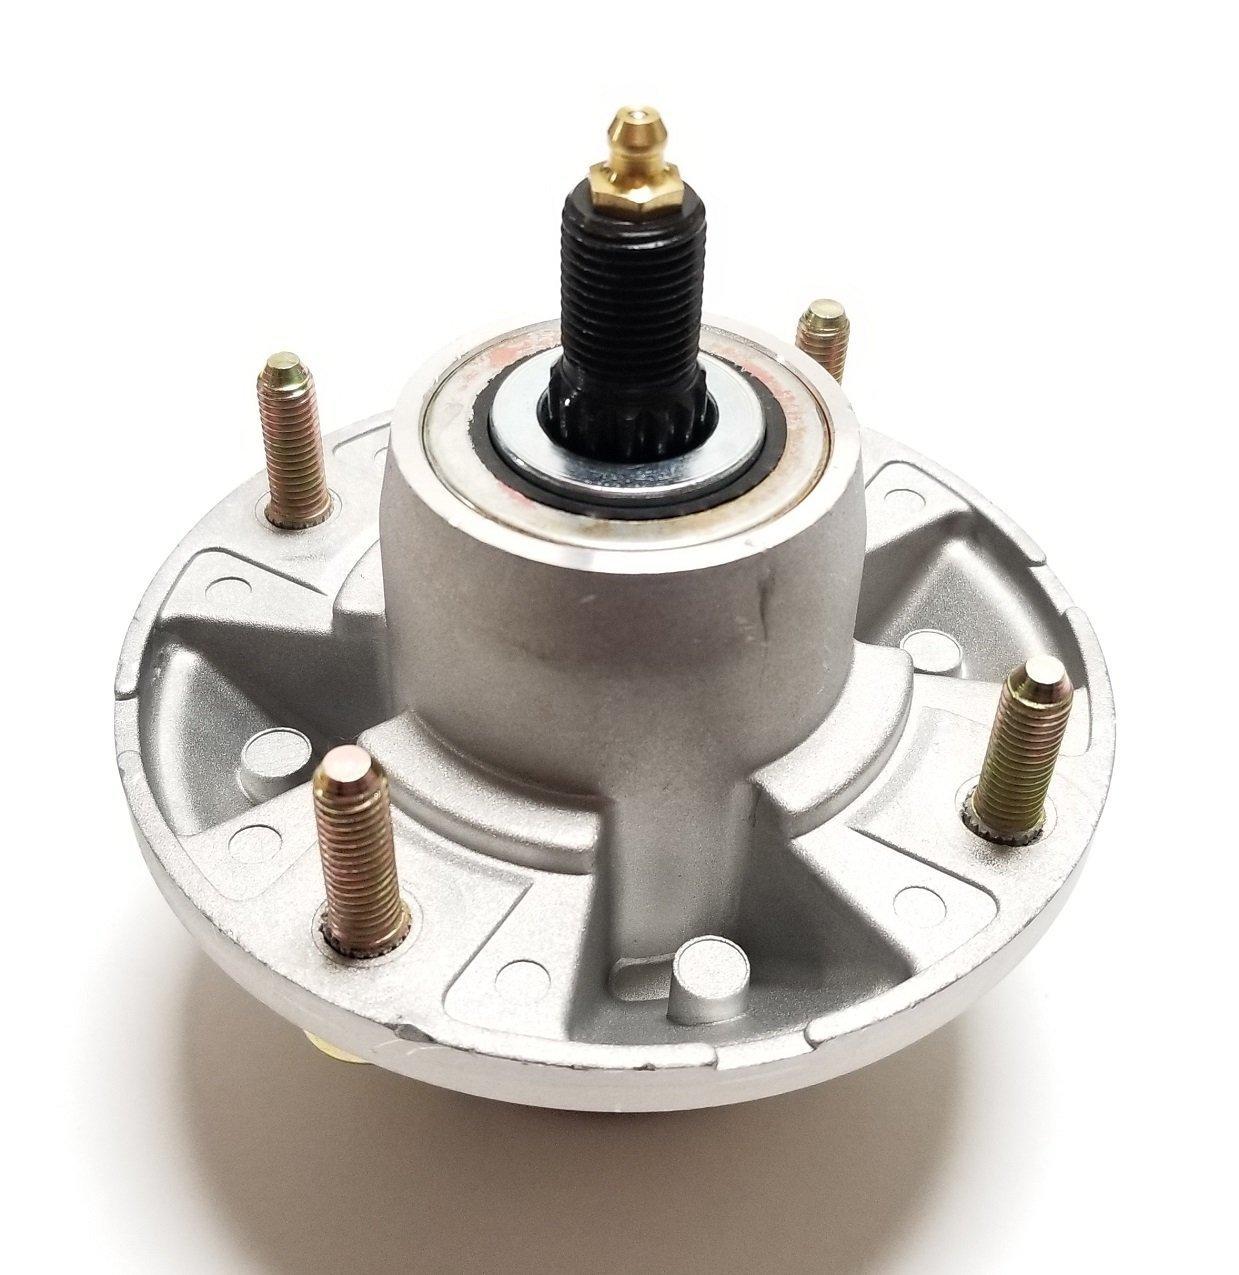 Lumix GC Spindle For John Deere X340 X360 X520 X534 X540 X710 X730 ...